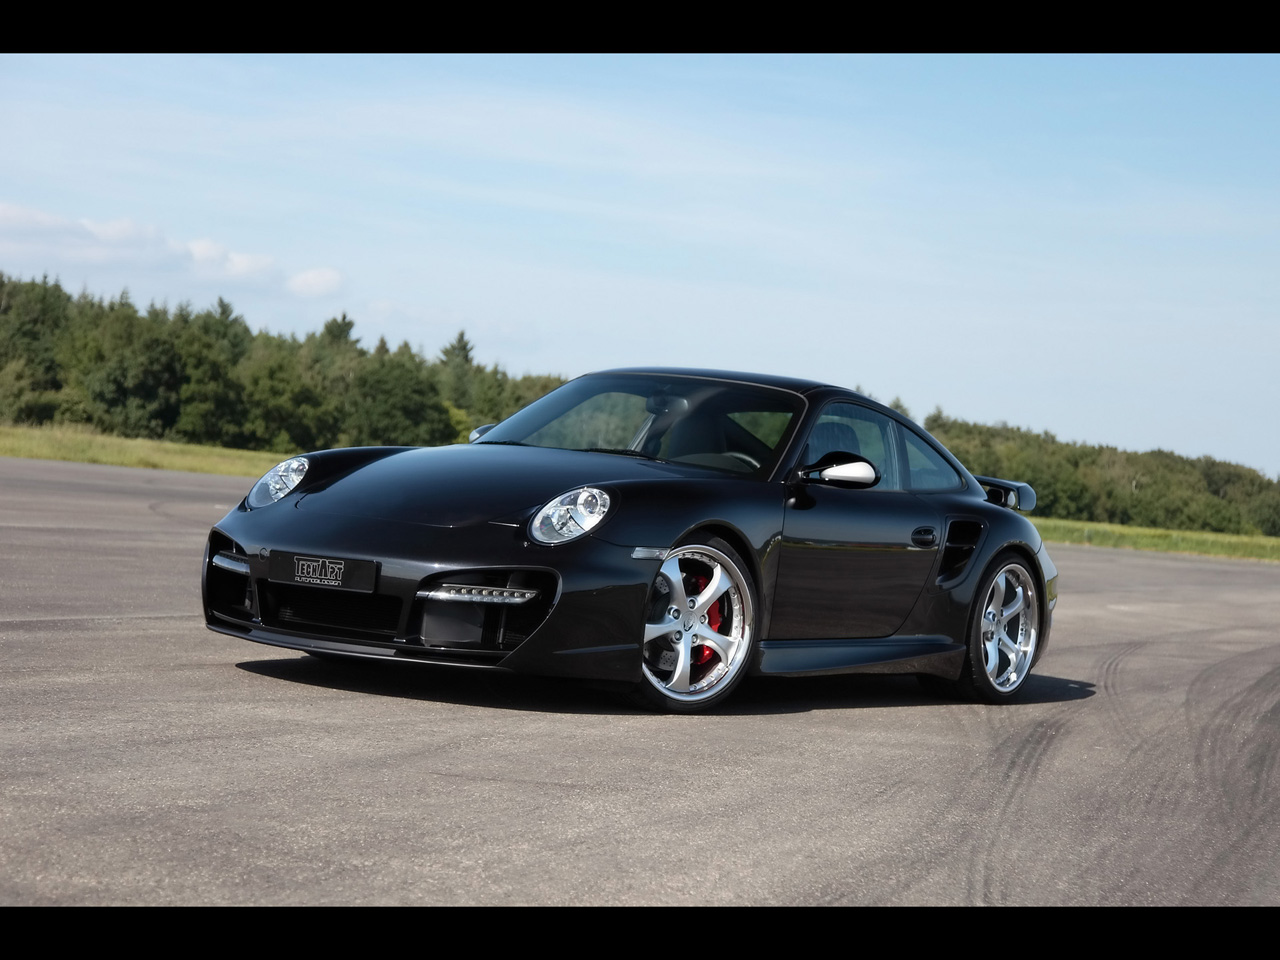 2006 <b>Porsche 911</b> 997 <b>Turbo</b> - Side - <b>1280x960 Wallpaper</b>